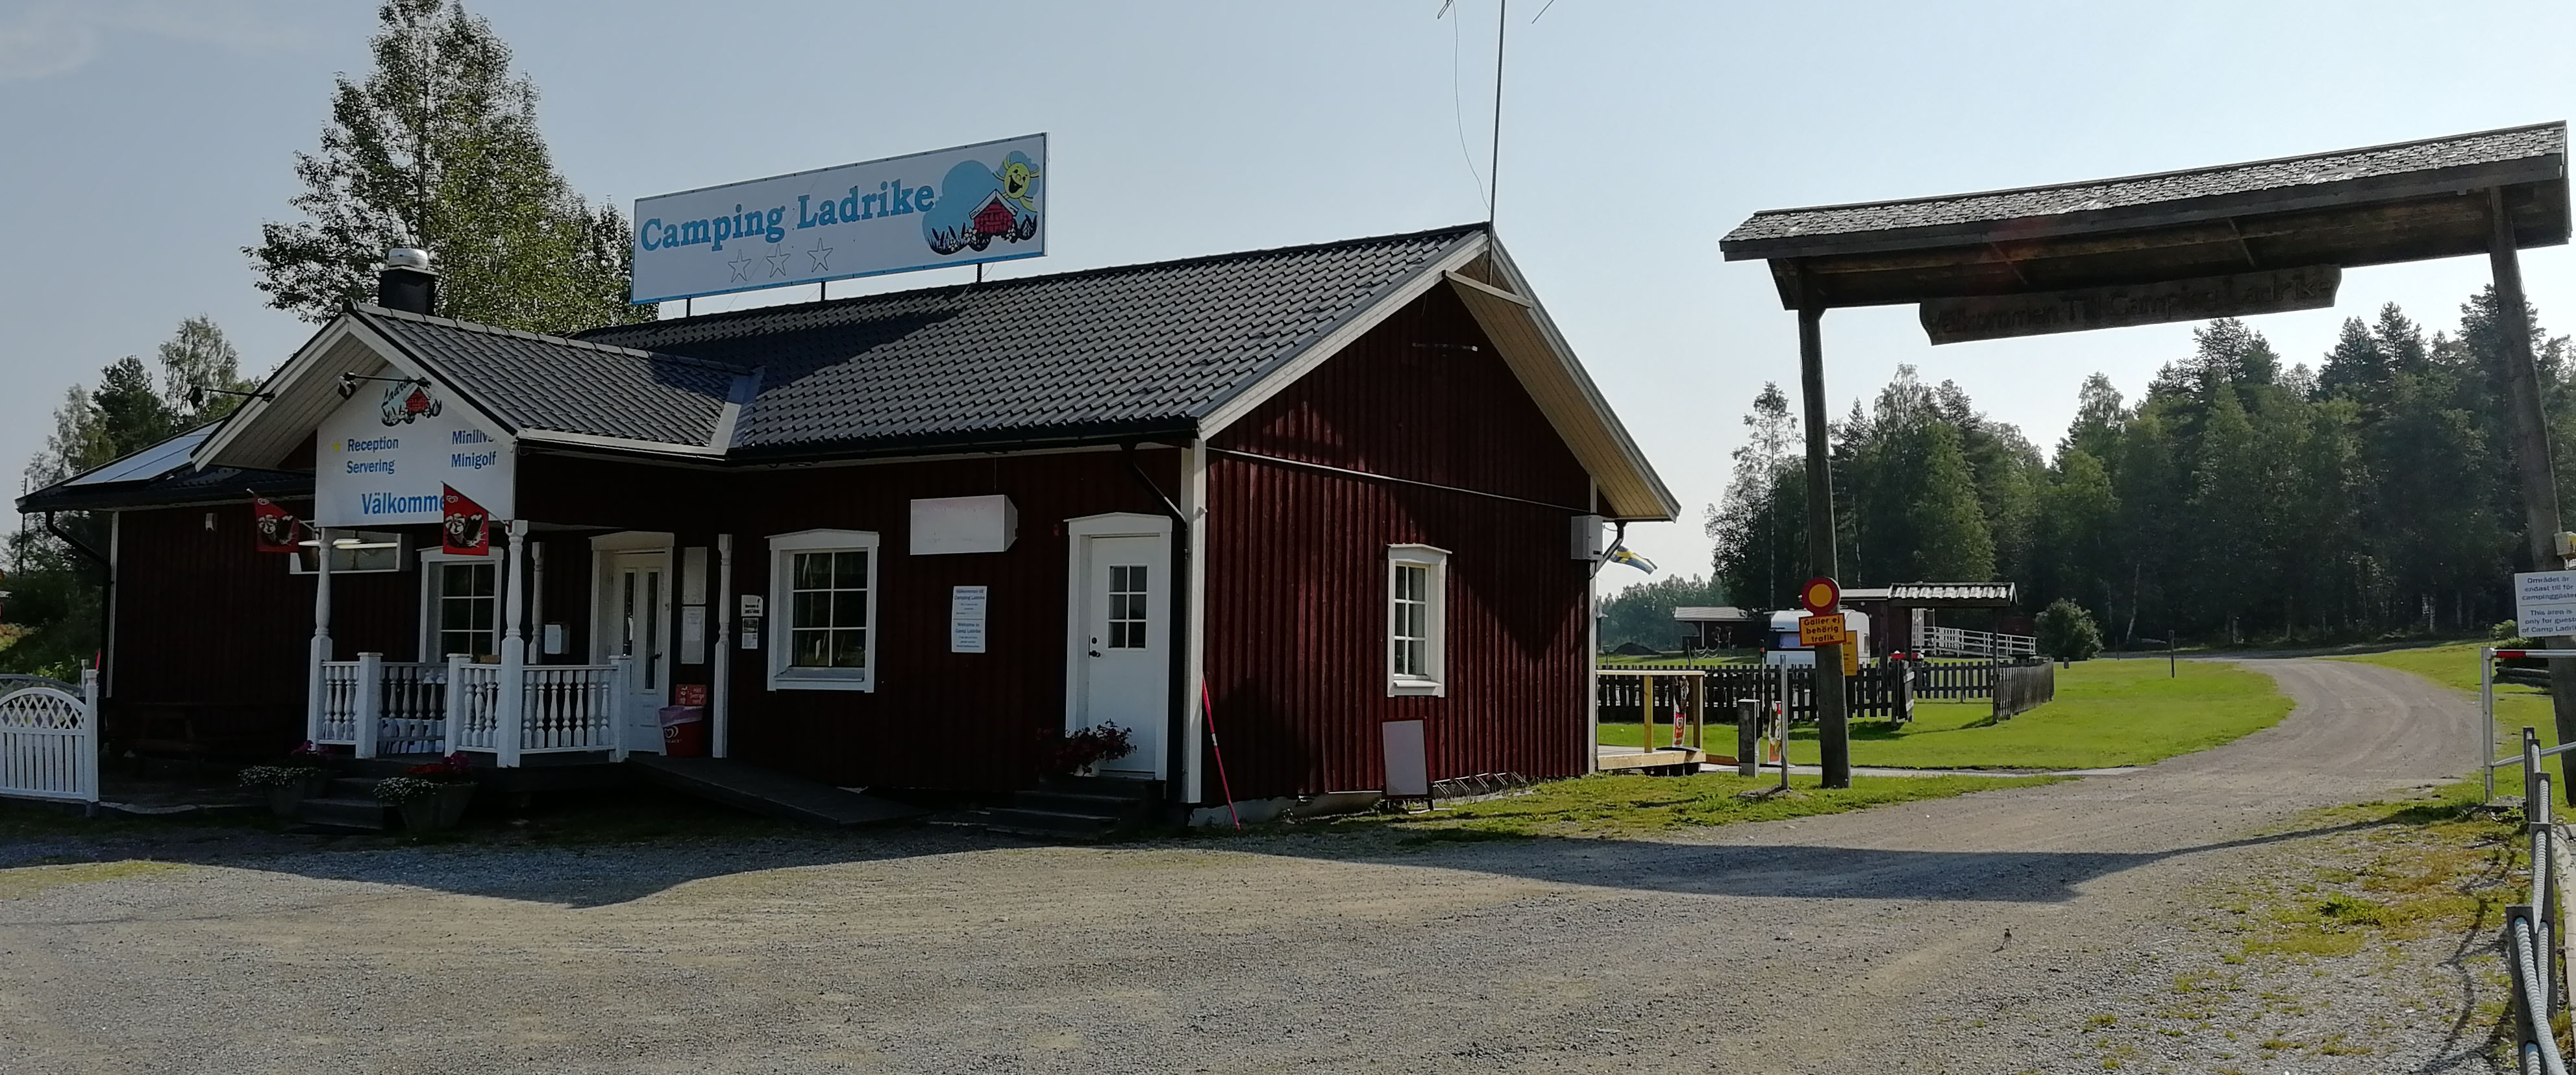 Camp Ladrike infart